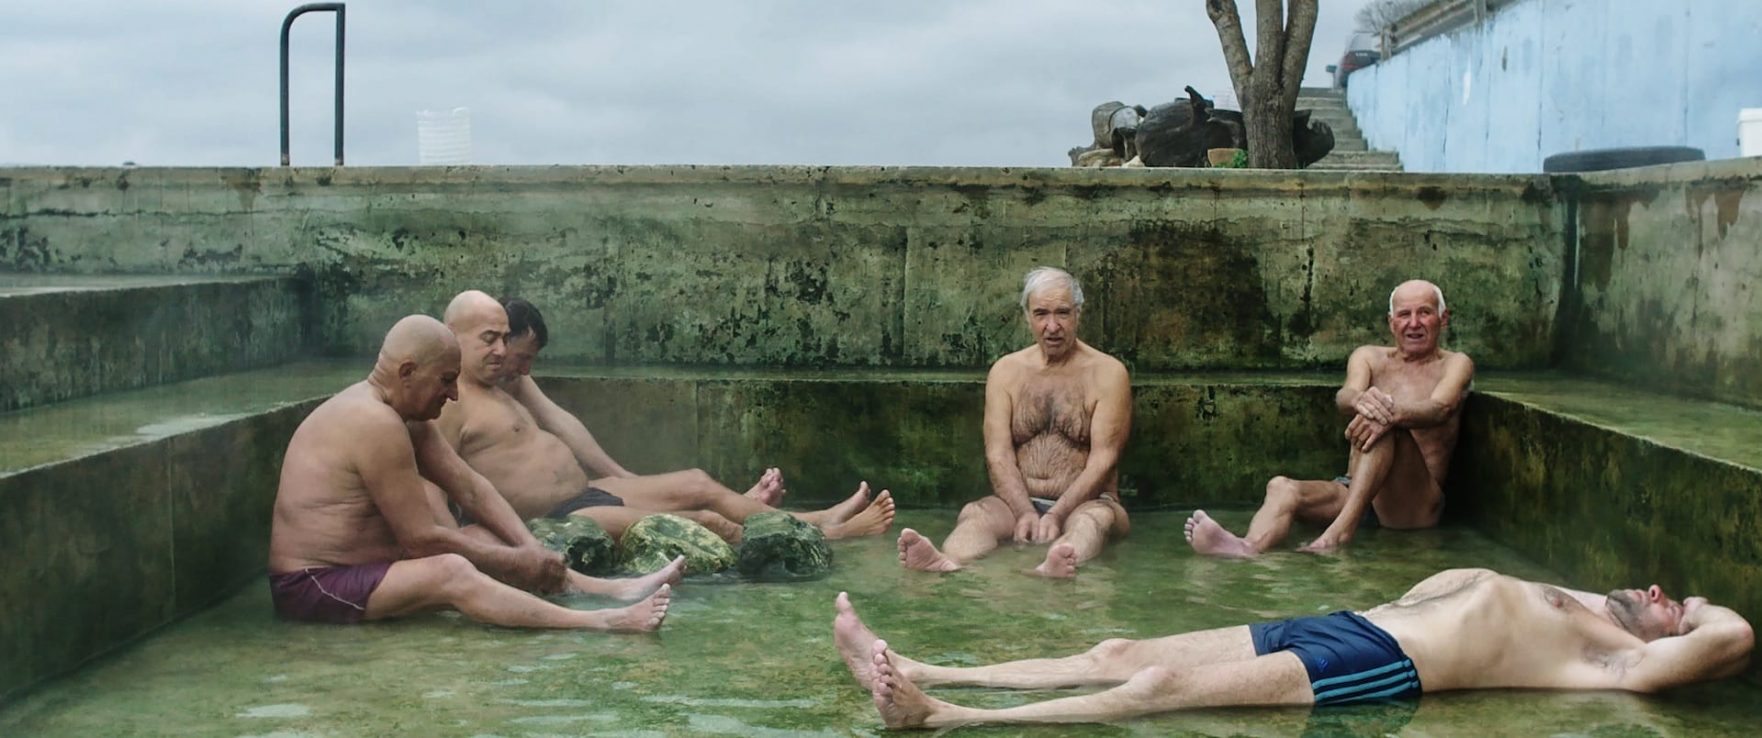 Die Grube, Hristiana Raykova, nominiert First Steps Award 2019